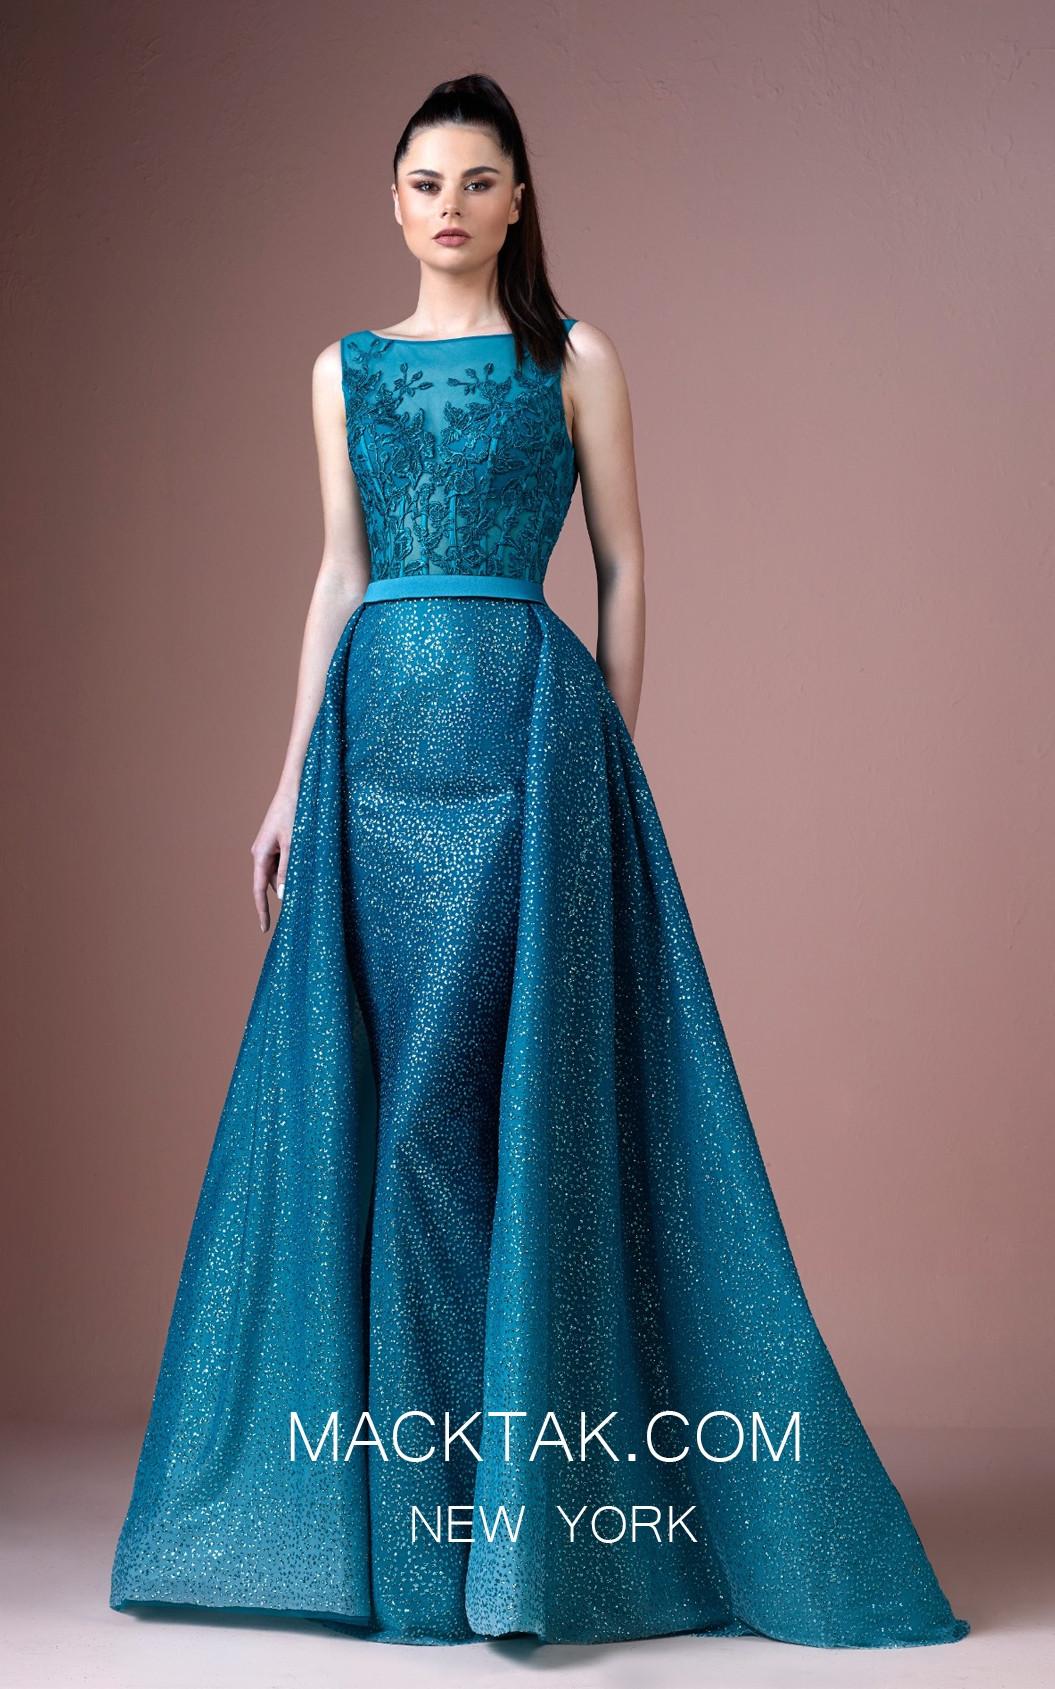 Gatti Nolli OP4759 Front Dress